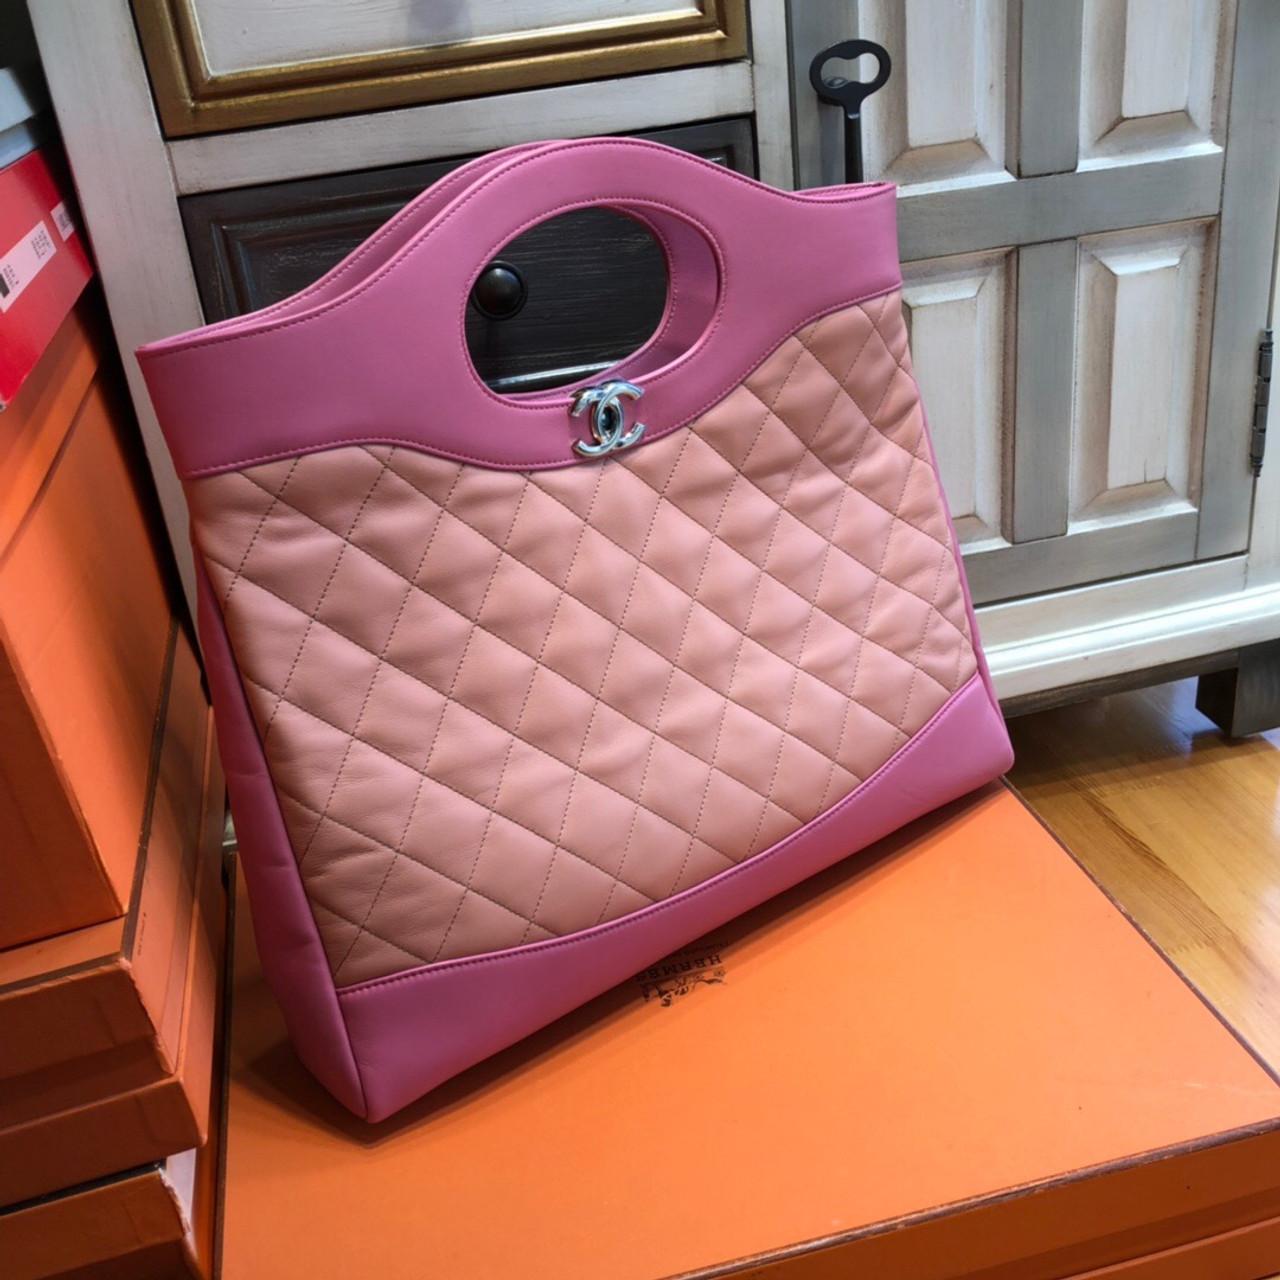 b1848422de20 CHANEL 31 Large Shopping Bag Pink - Bella Vita Moda